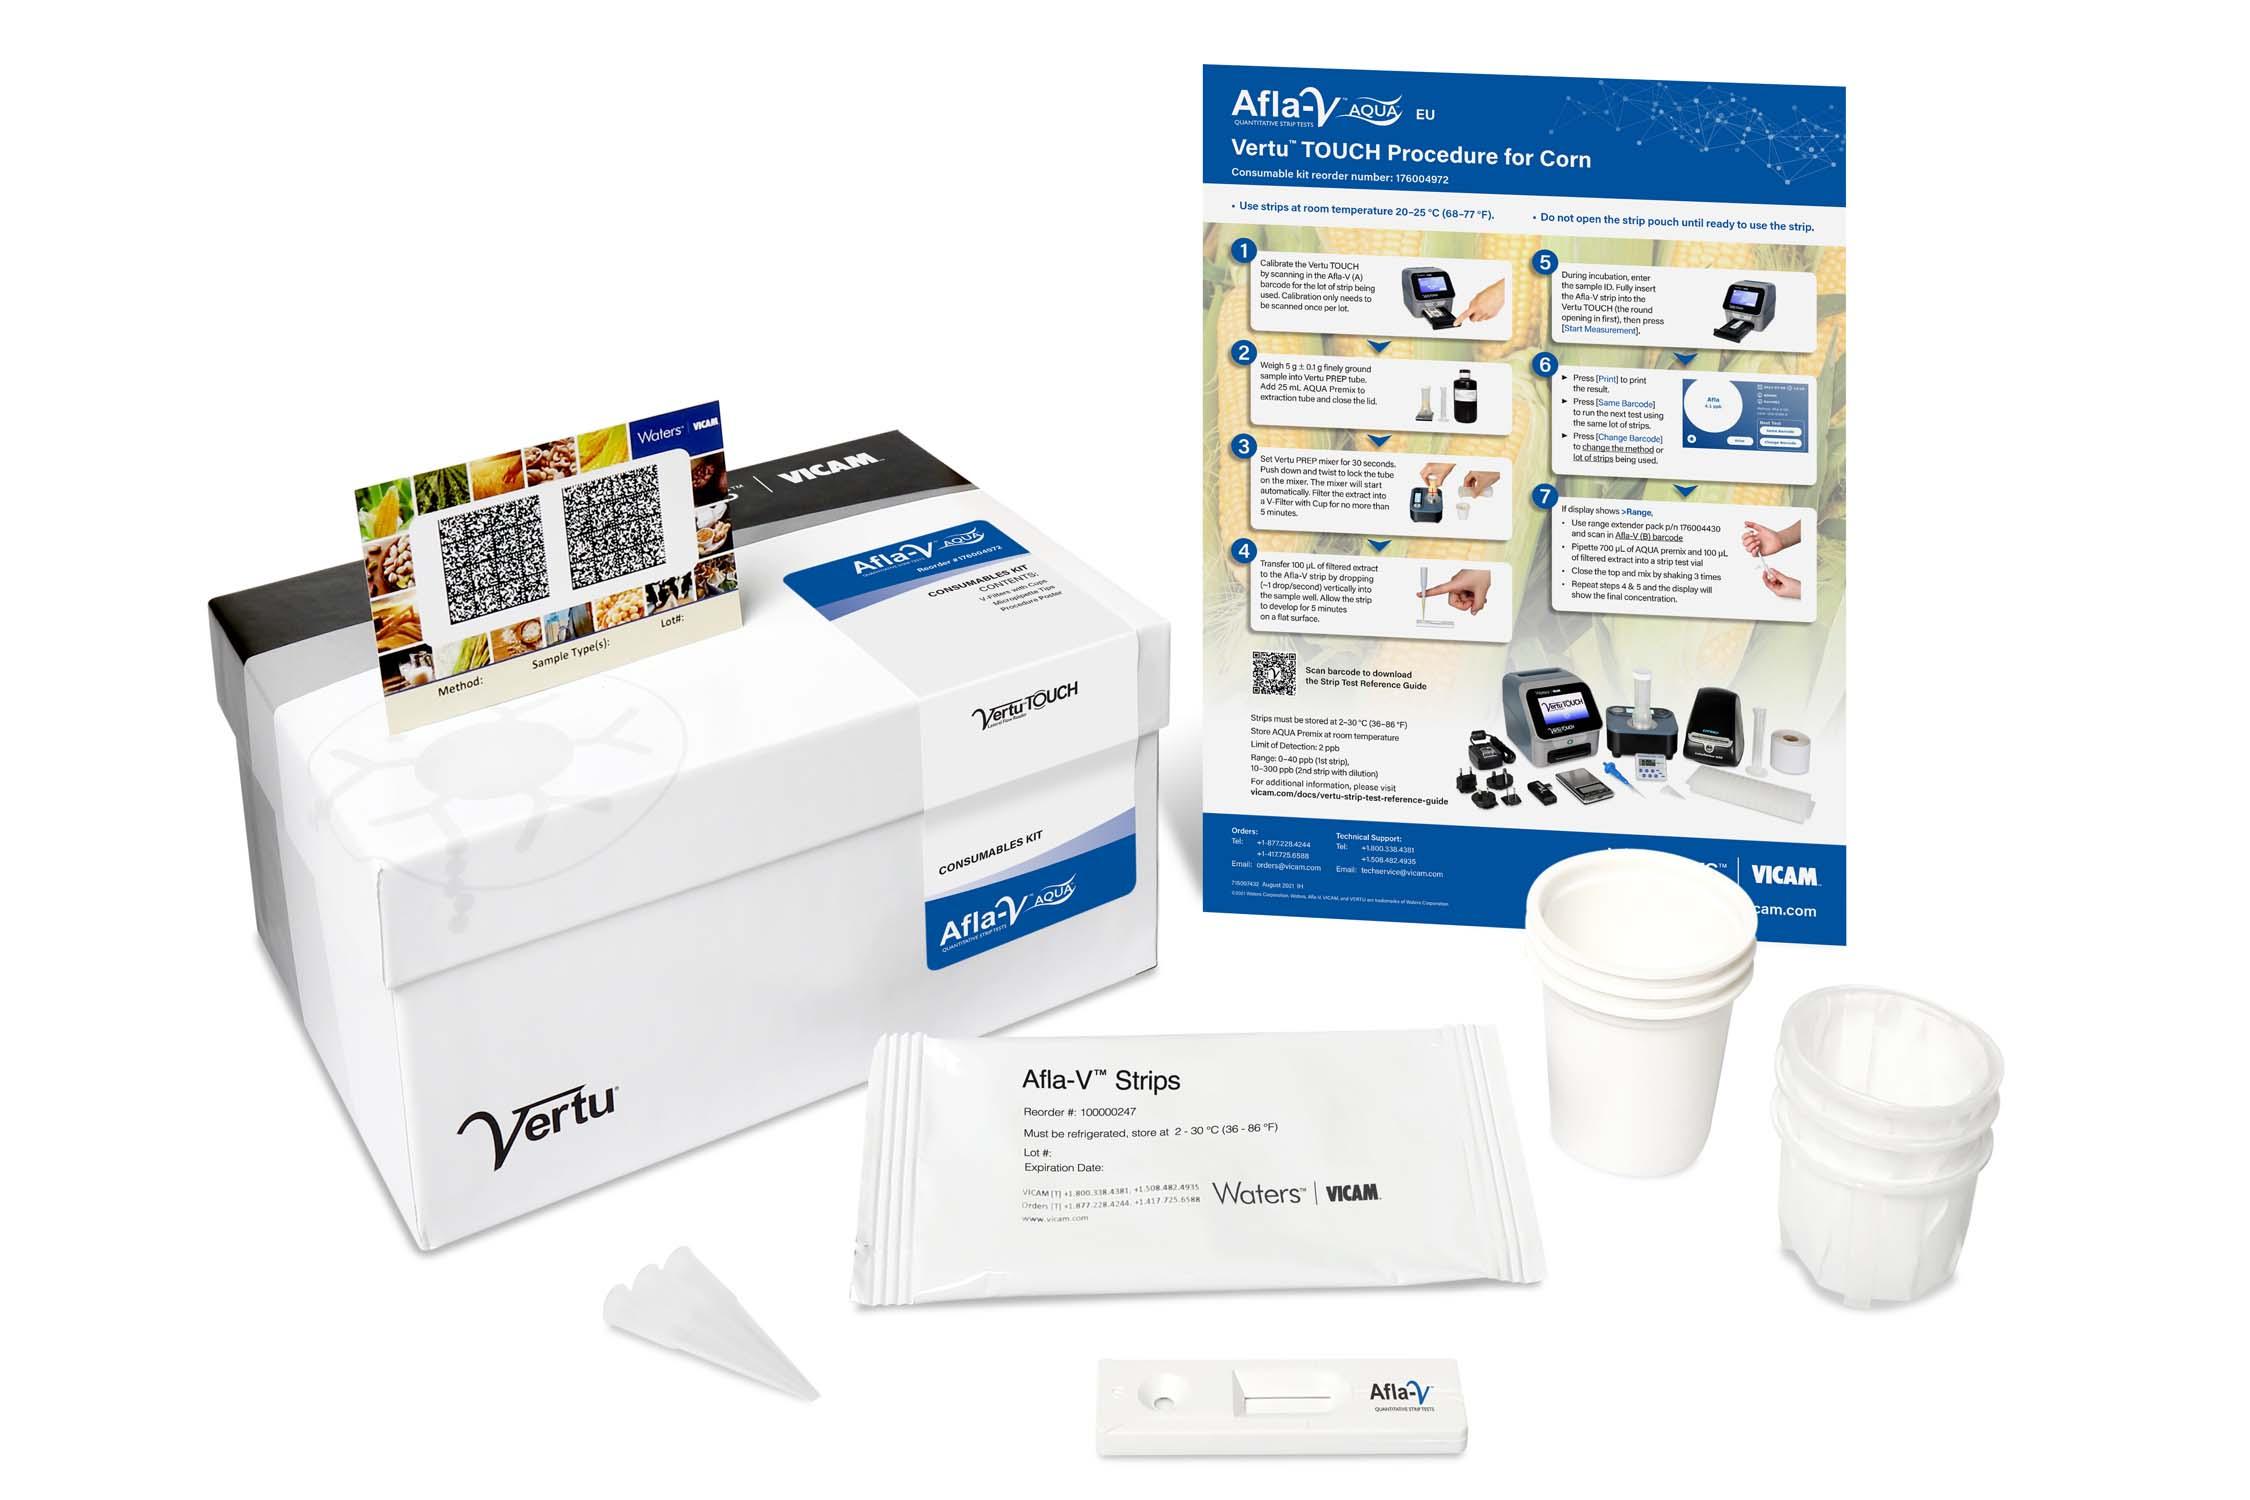 Afla-V AQUA VT Kit (25 Tests)